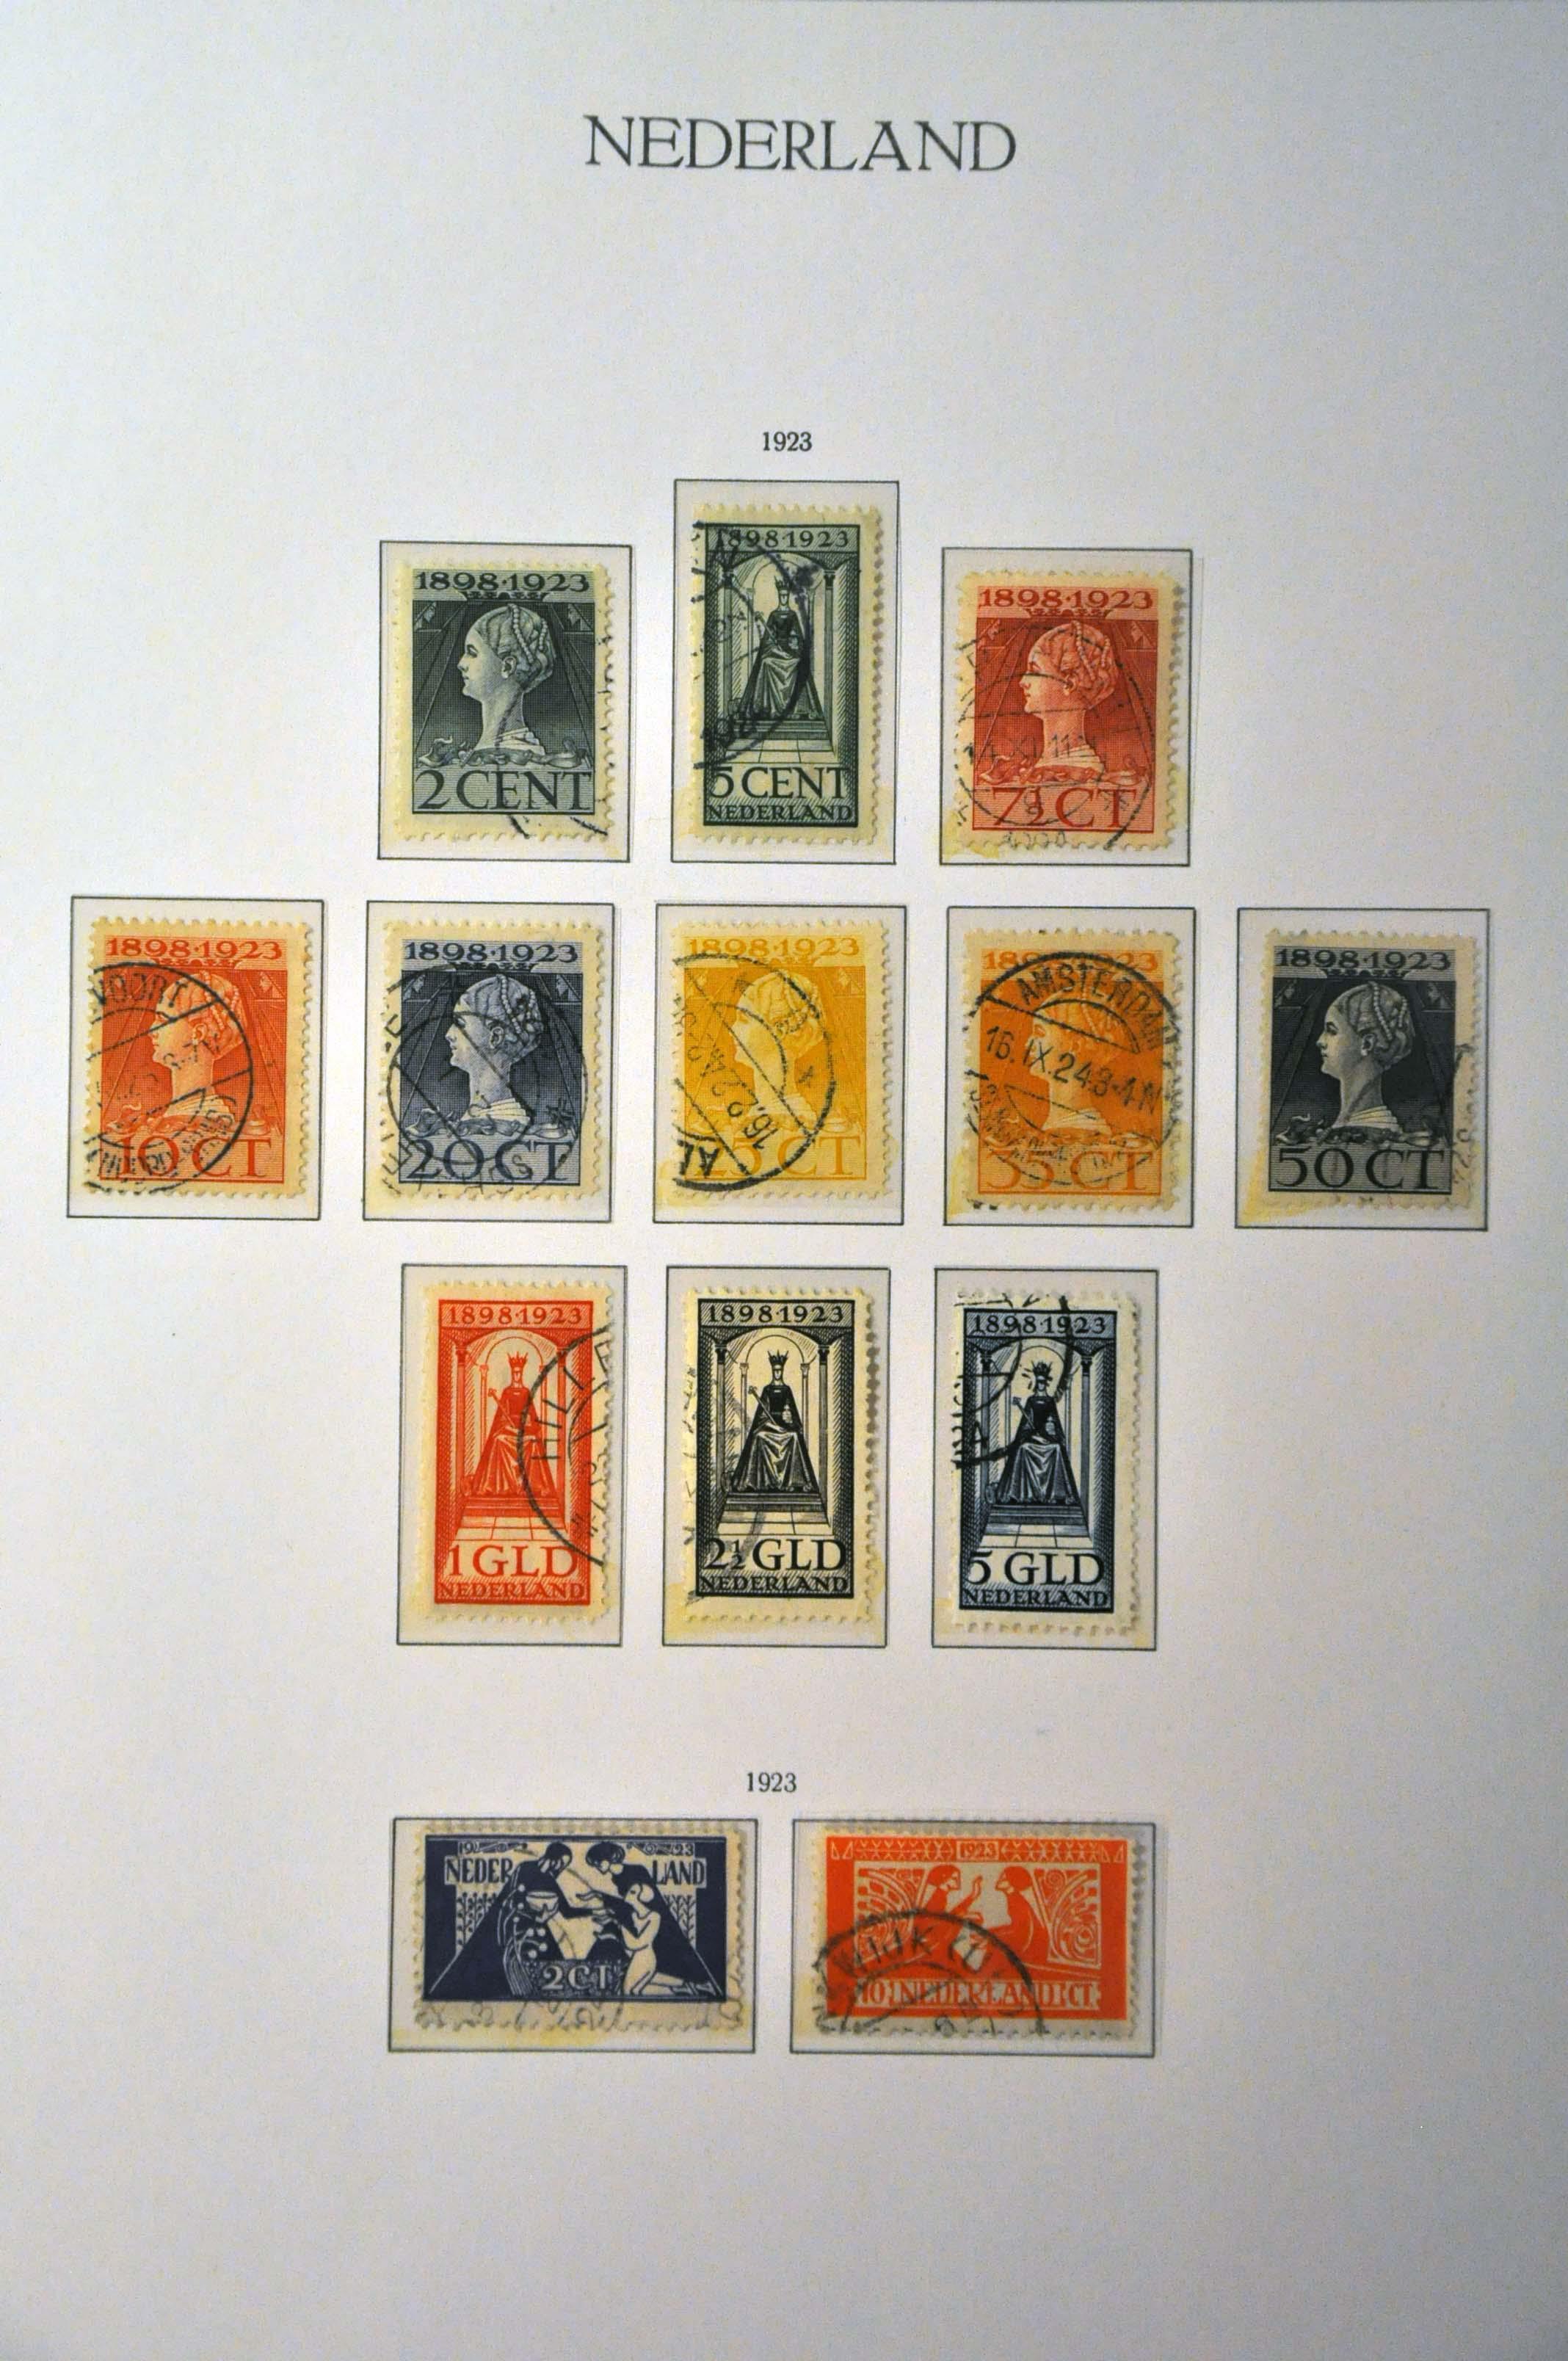 Lot 1472 - Netherlands and former colonies Netherlands -  Corinphila Veilingen Auction 239: General sale